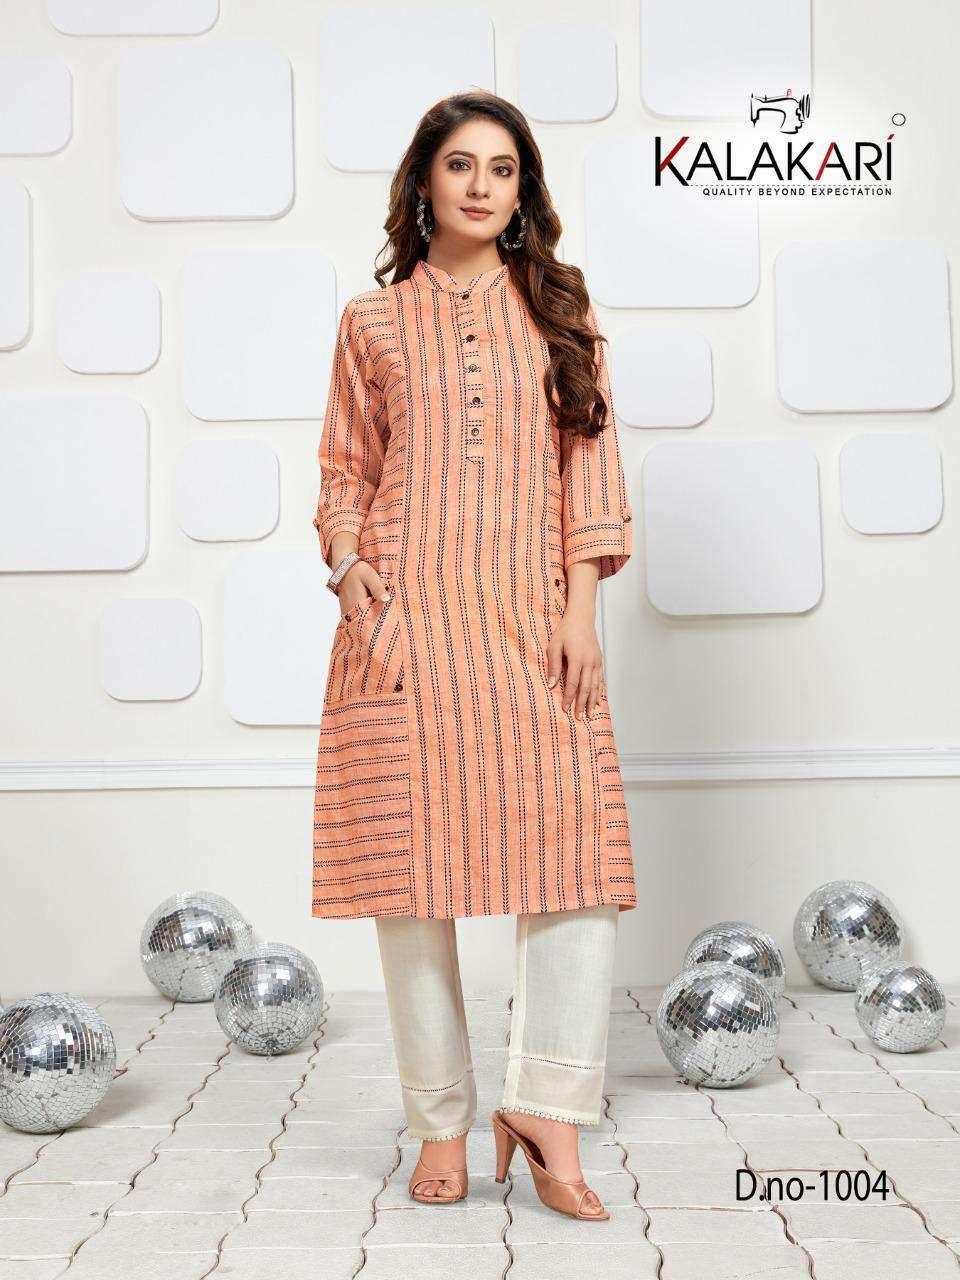 kalakari nx trendz vol 6 series 1001-1004 pure cotton kurti